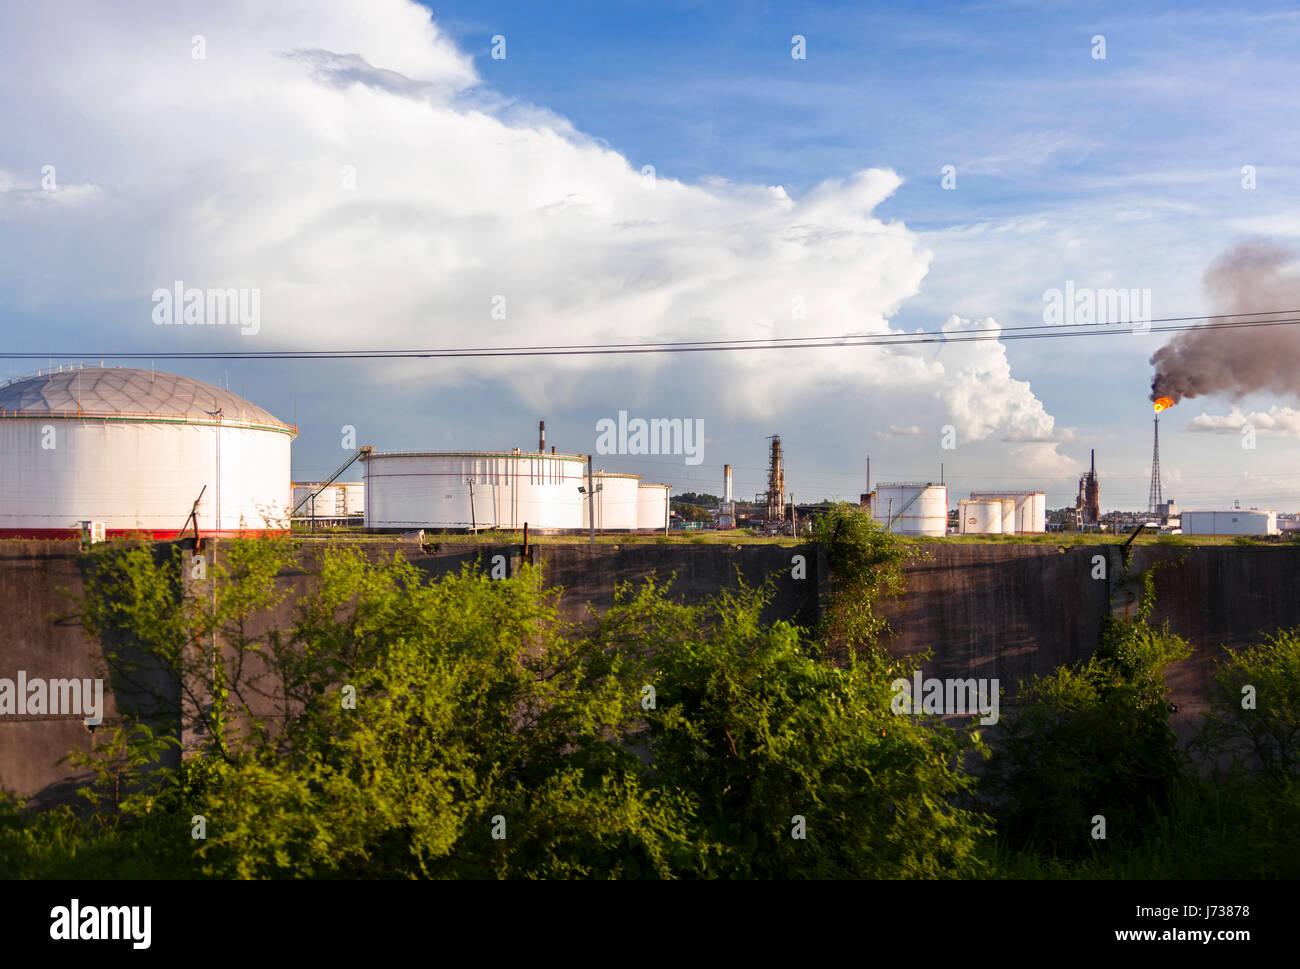 The Cuba Oil Union refinery in Havana, Cuba. Stock Photo